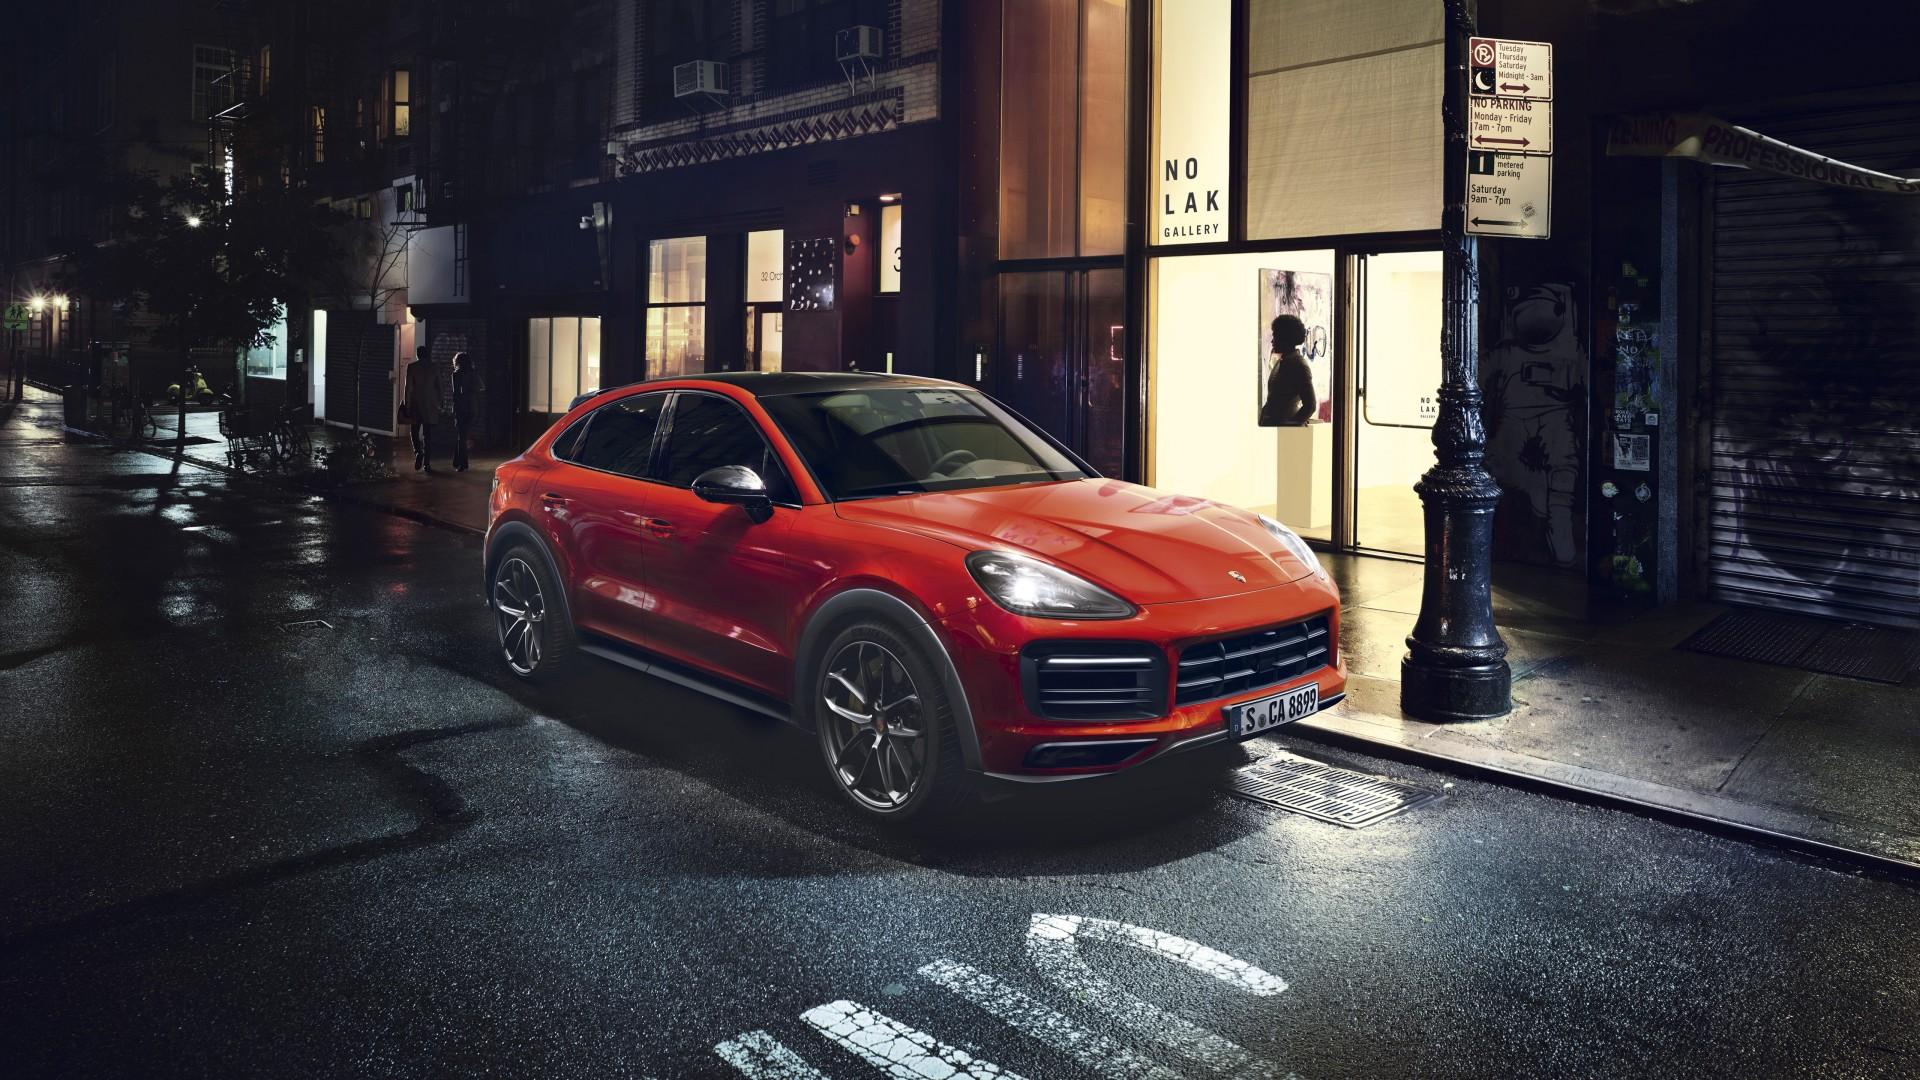 Audi Iphone X Wallpaper Porsche Cayenne Coupe 2019 4k Wallpaper Hd Car